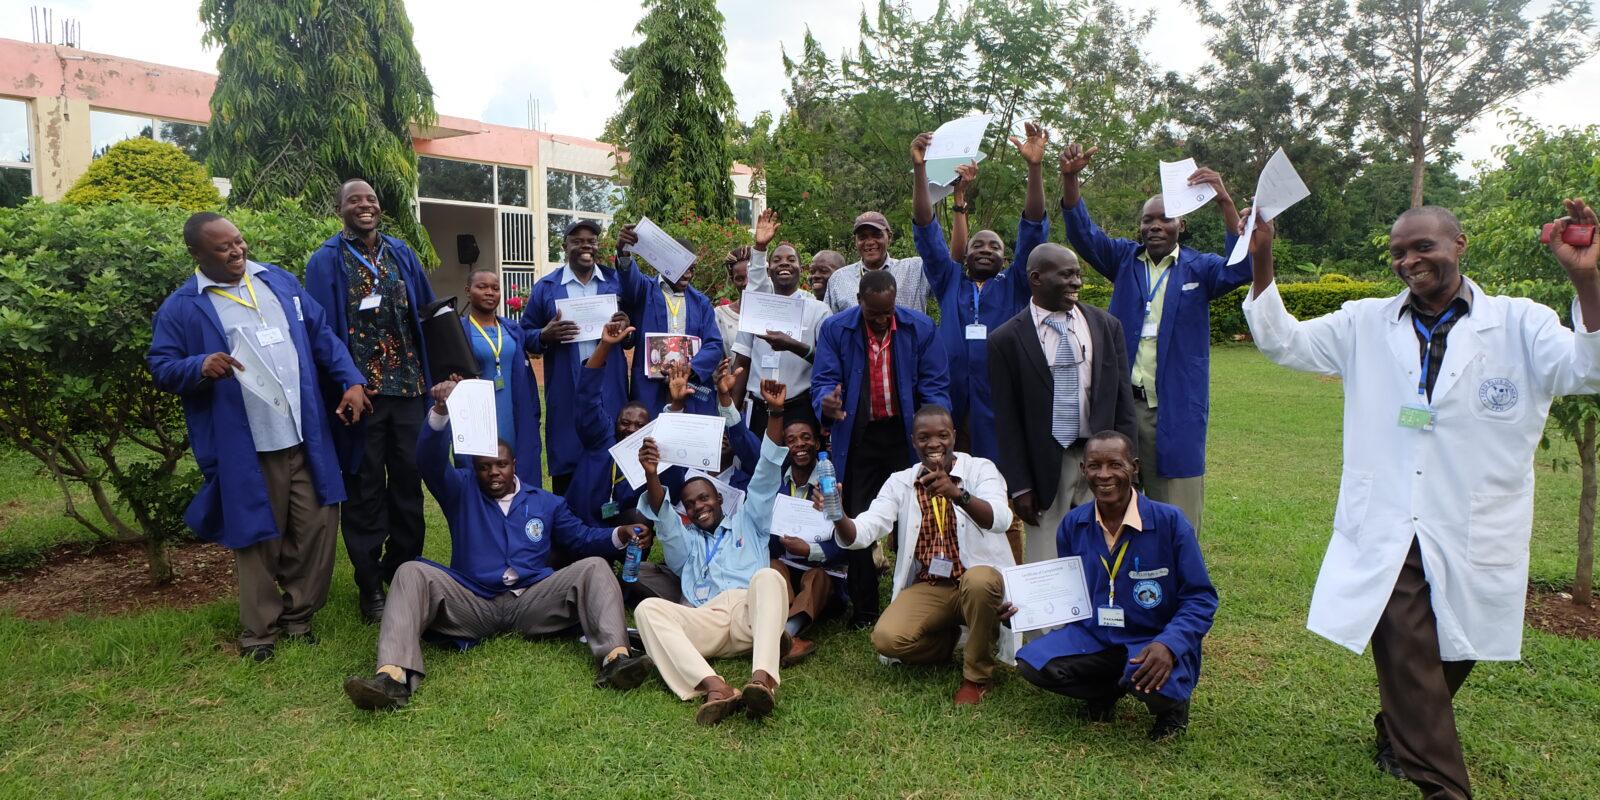 Fortbildungsprogramm in Uganda